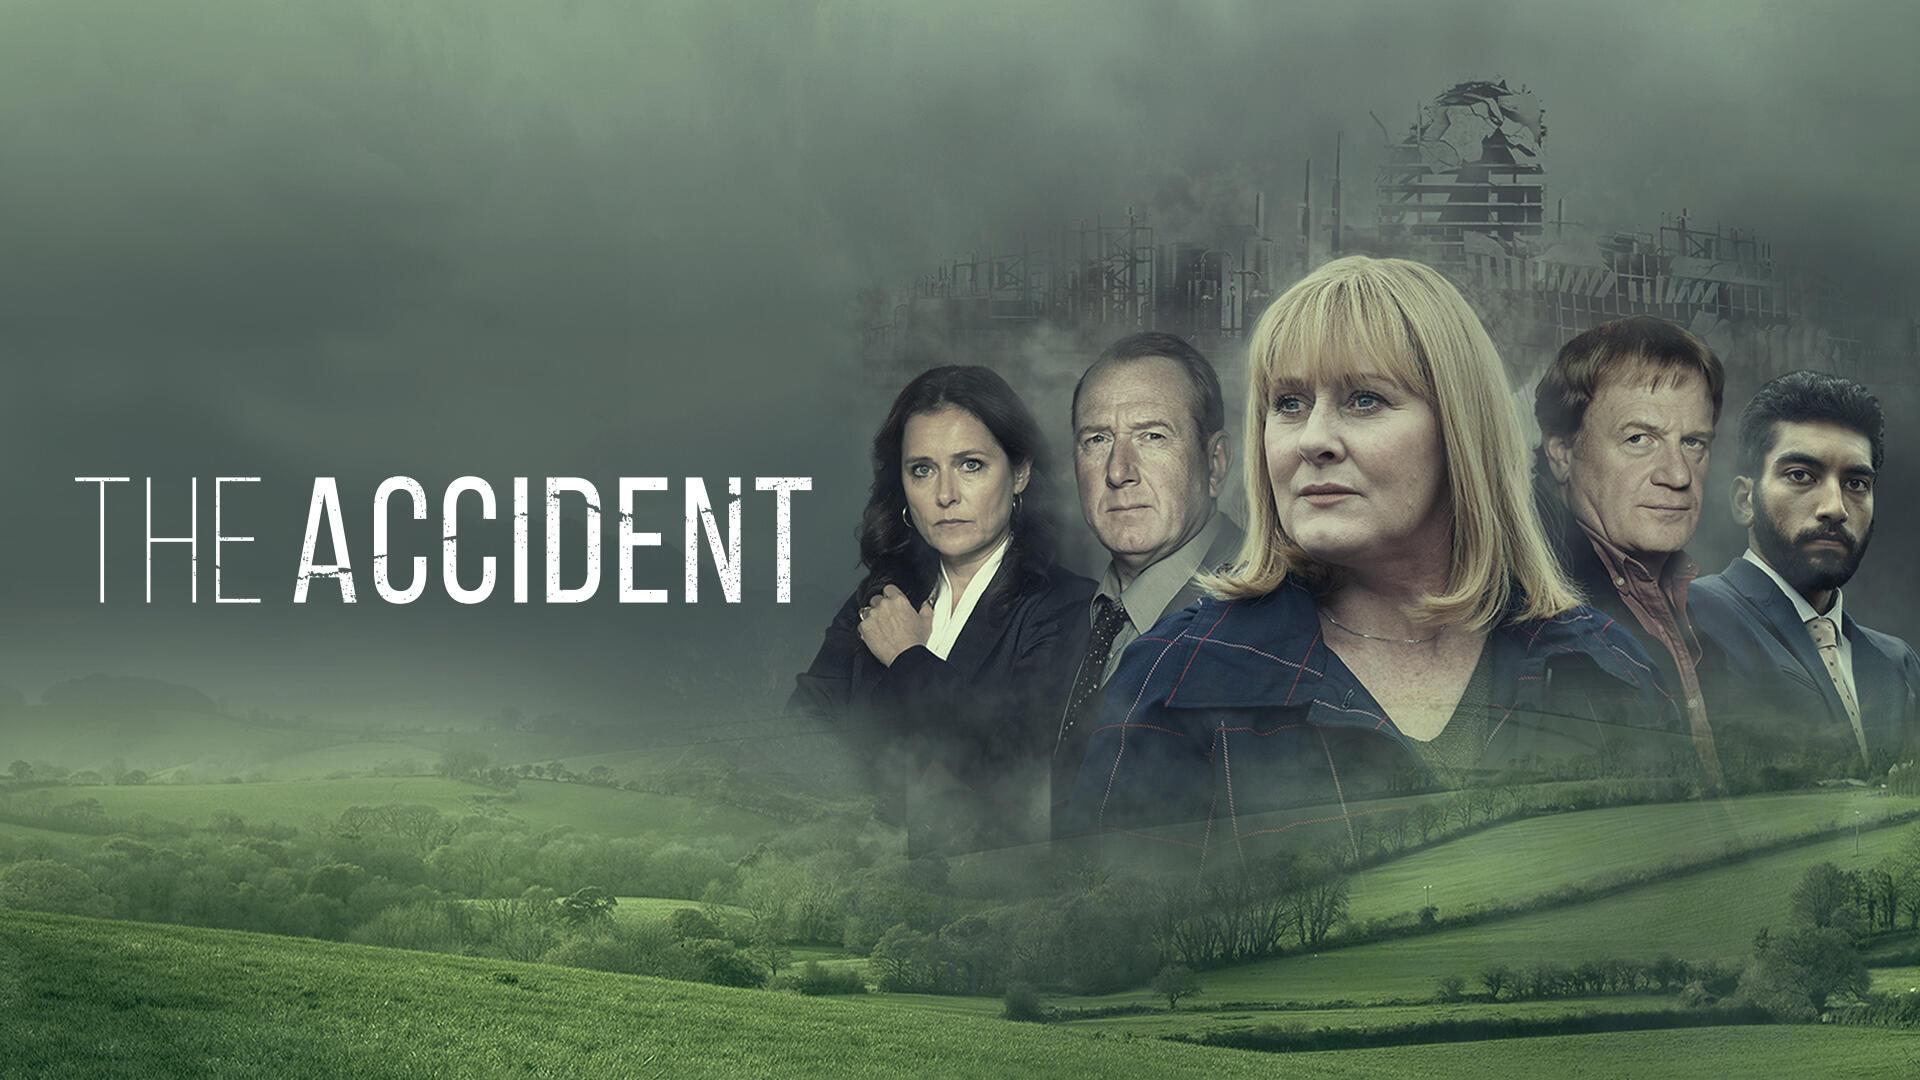 The_Accident_16x9_wTT